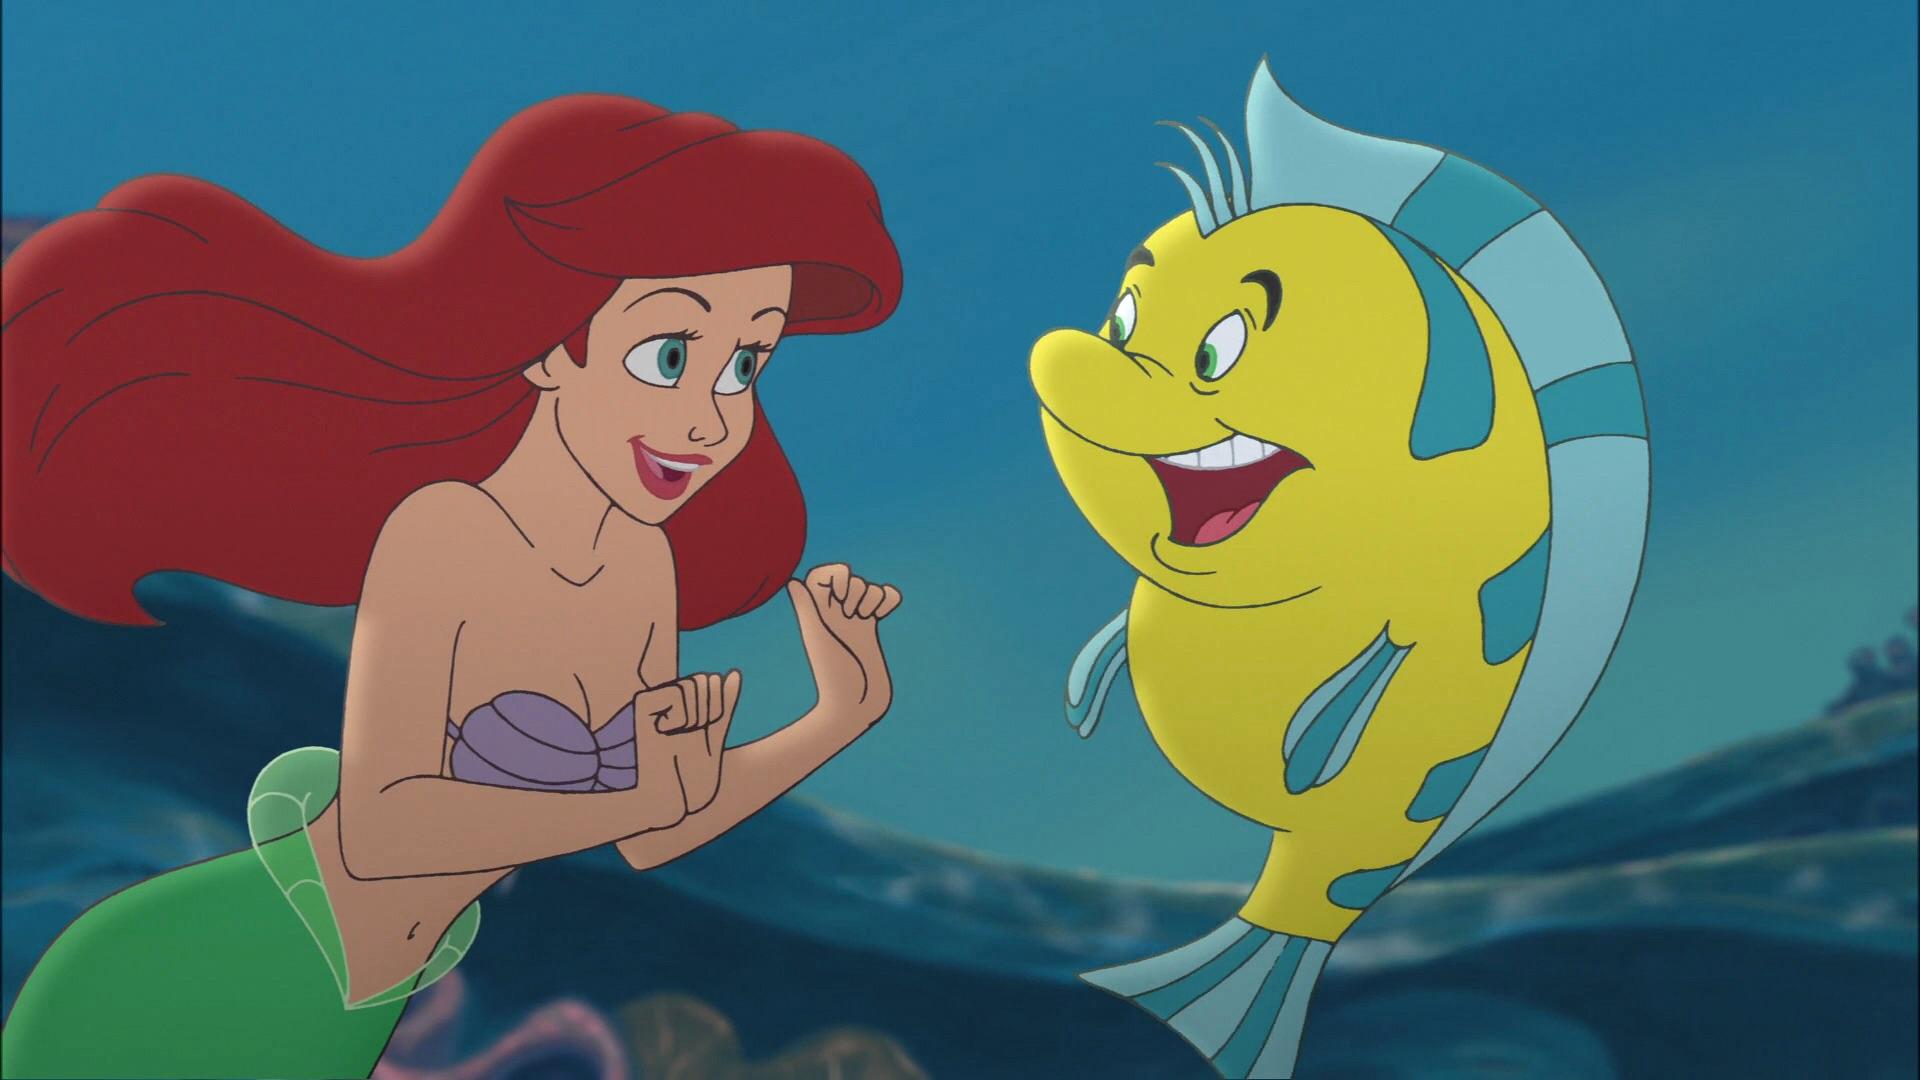 Uncategorized Flounder And Ariel image tlm2 disneyscreencaps com 5301 jpg disney wiki fandom jpg